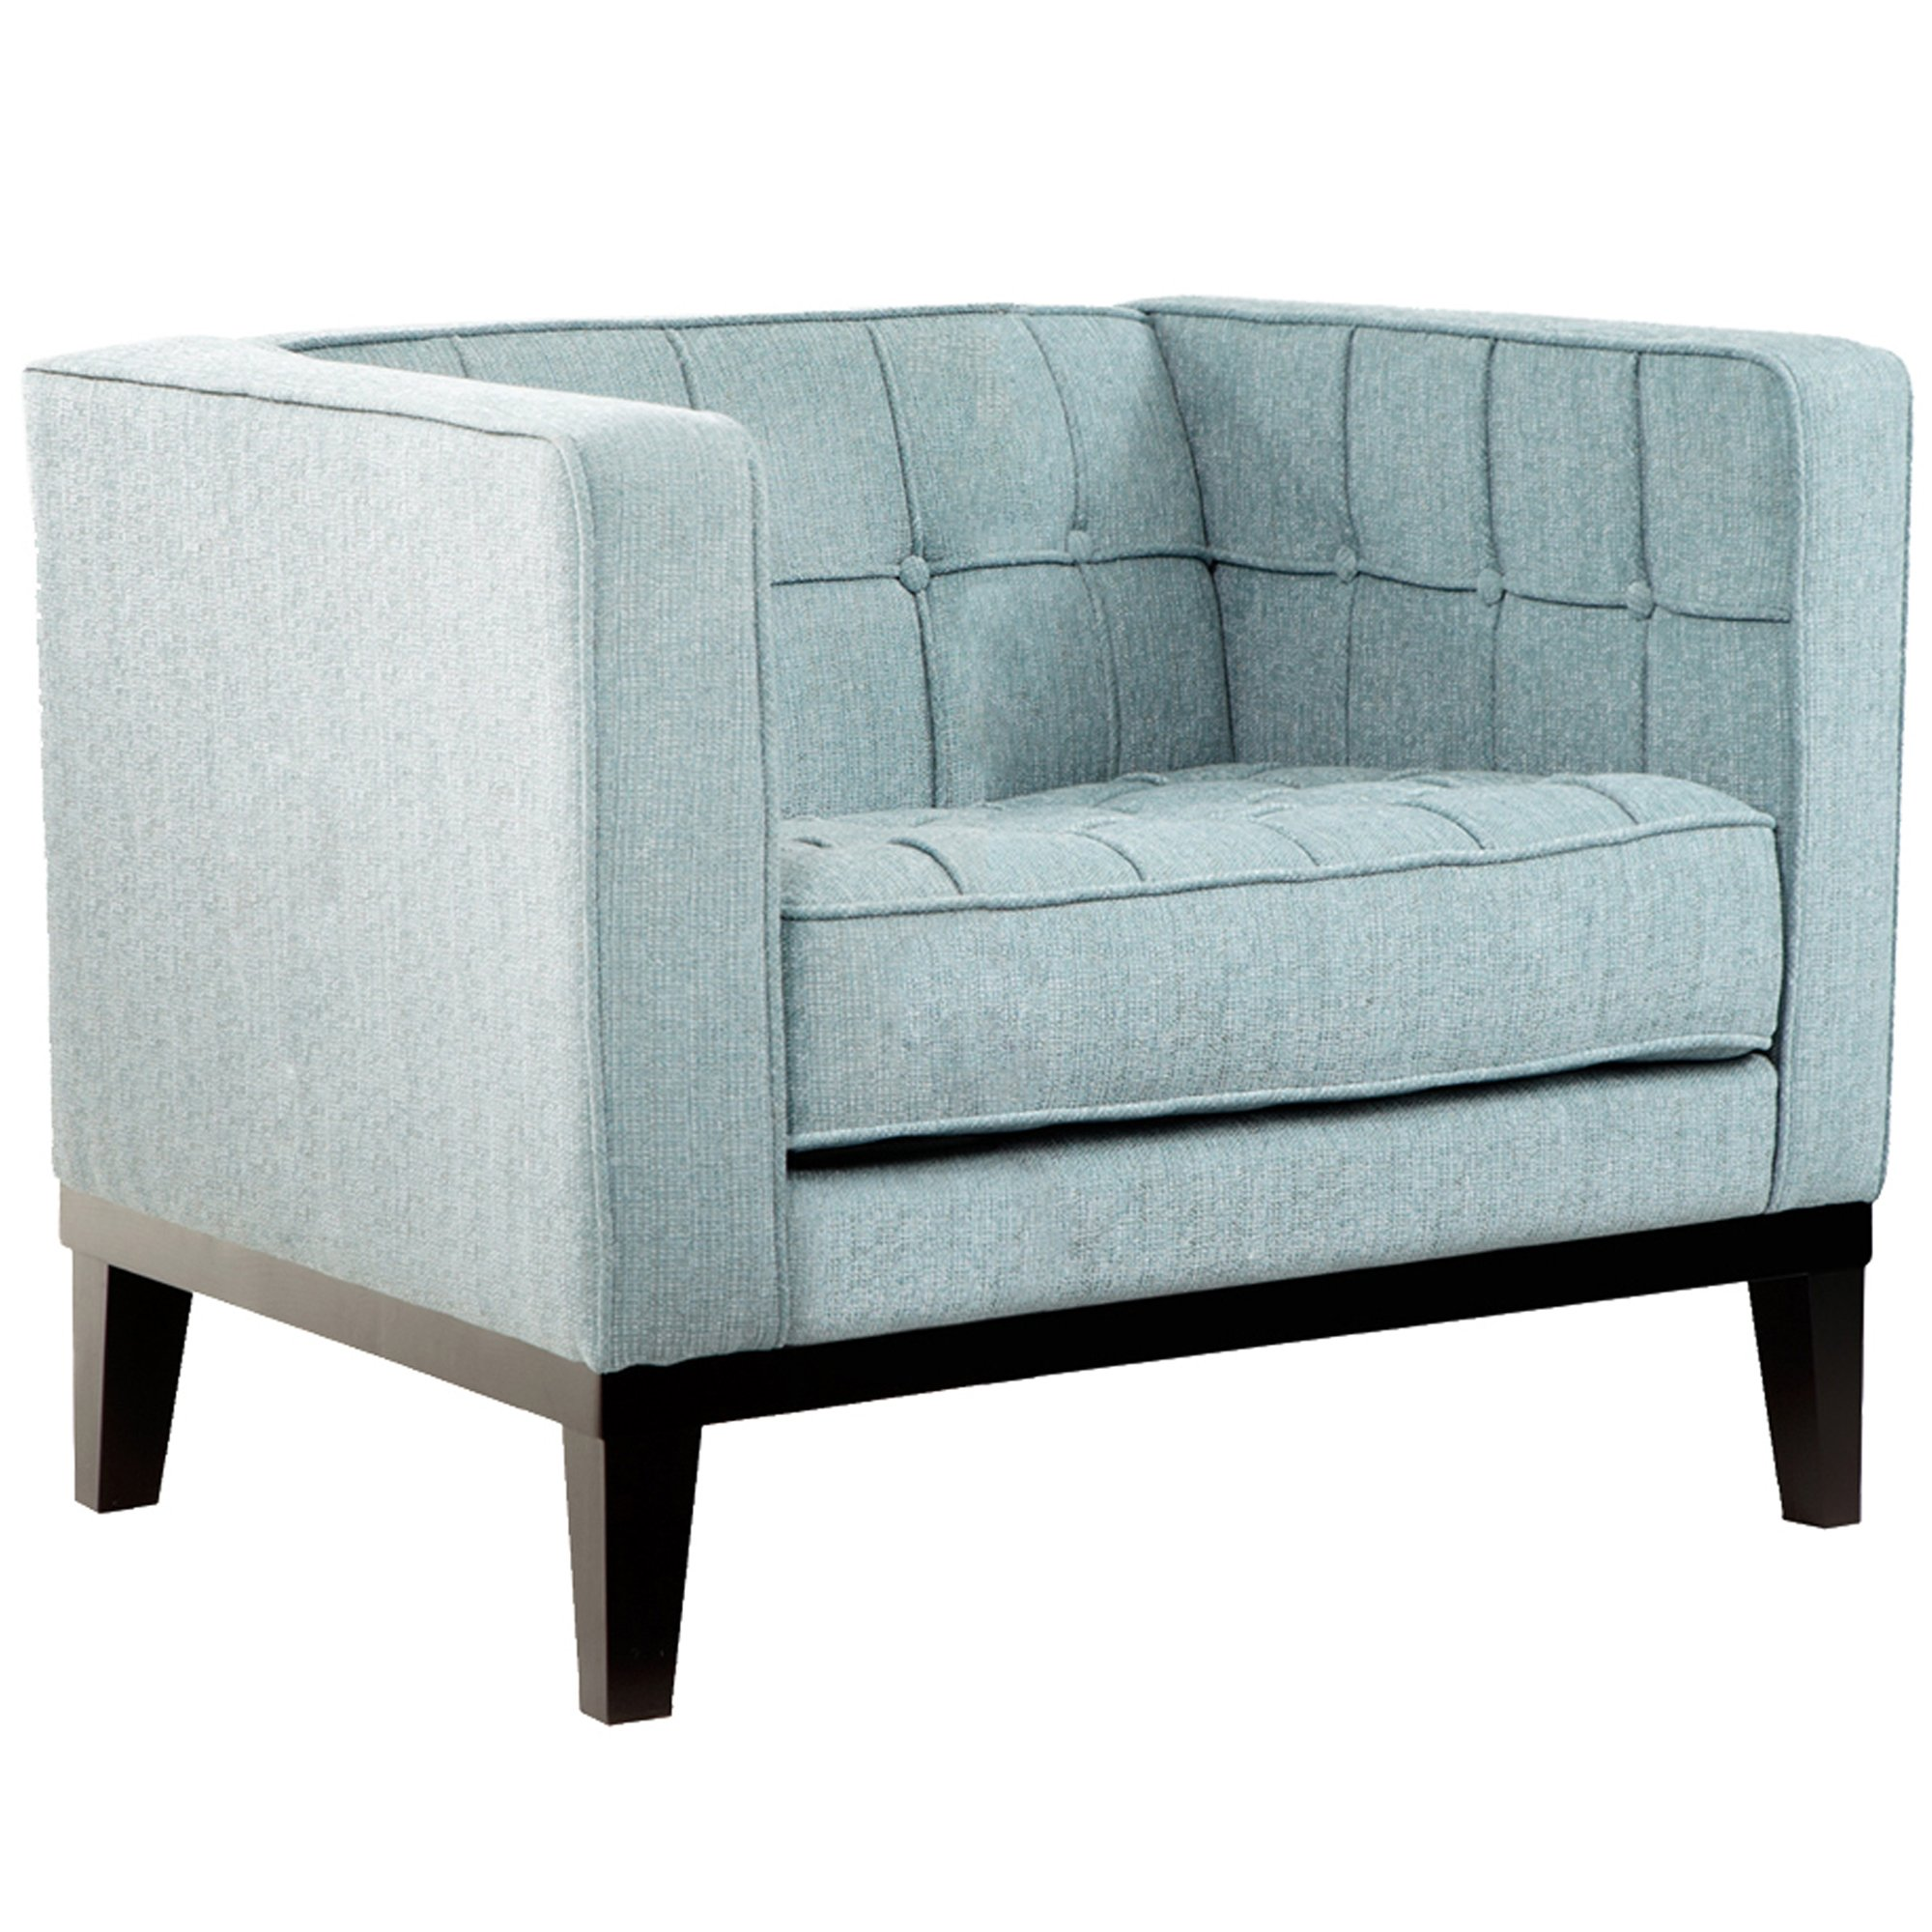 ARMEN LIVING Roxbury Chair, Spa Blue Fabric